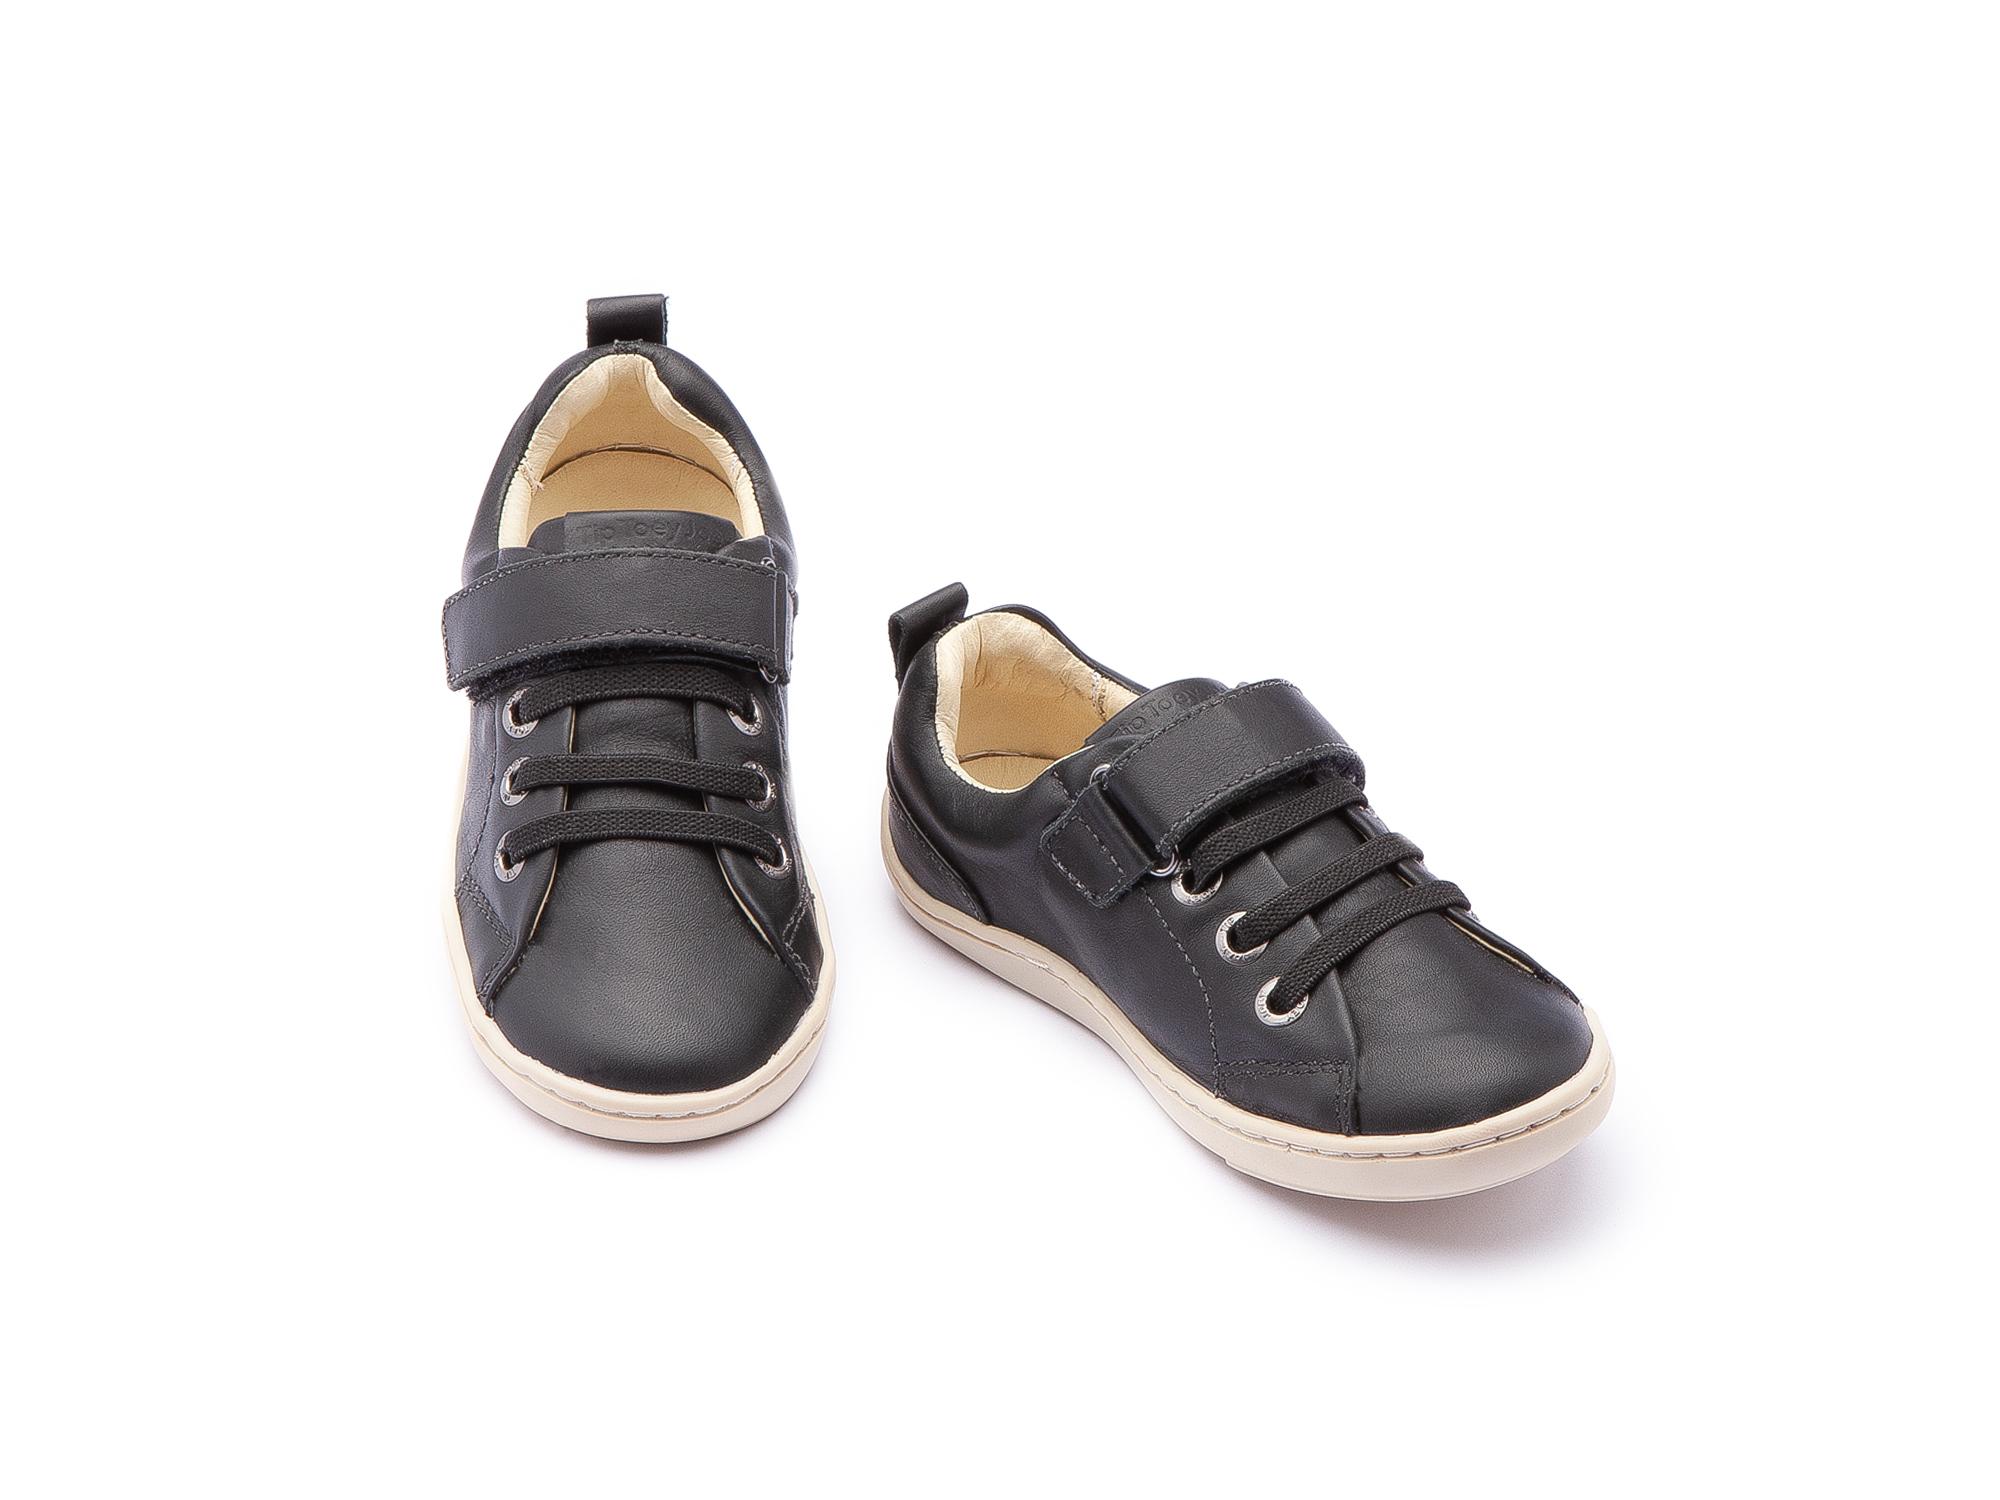 Tênis Little Grao Black/ Black Toddler 2 à 4 anos - 1